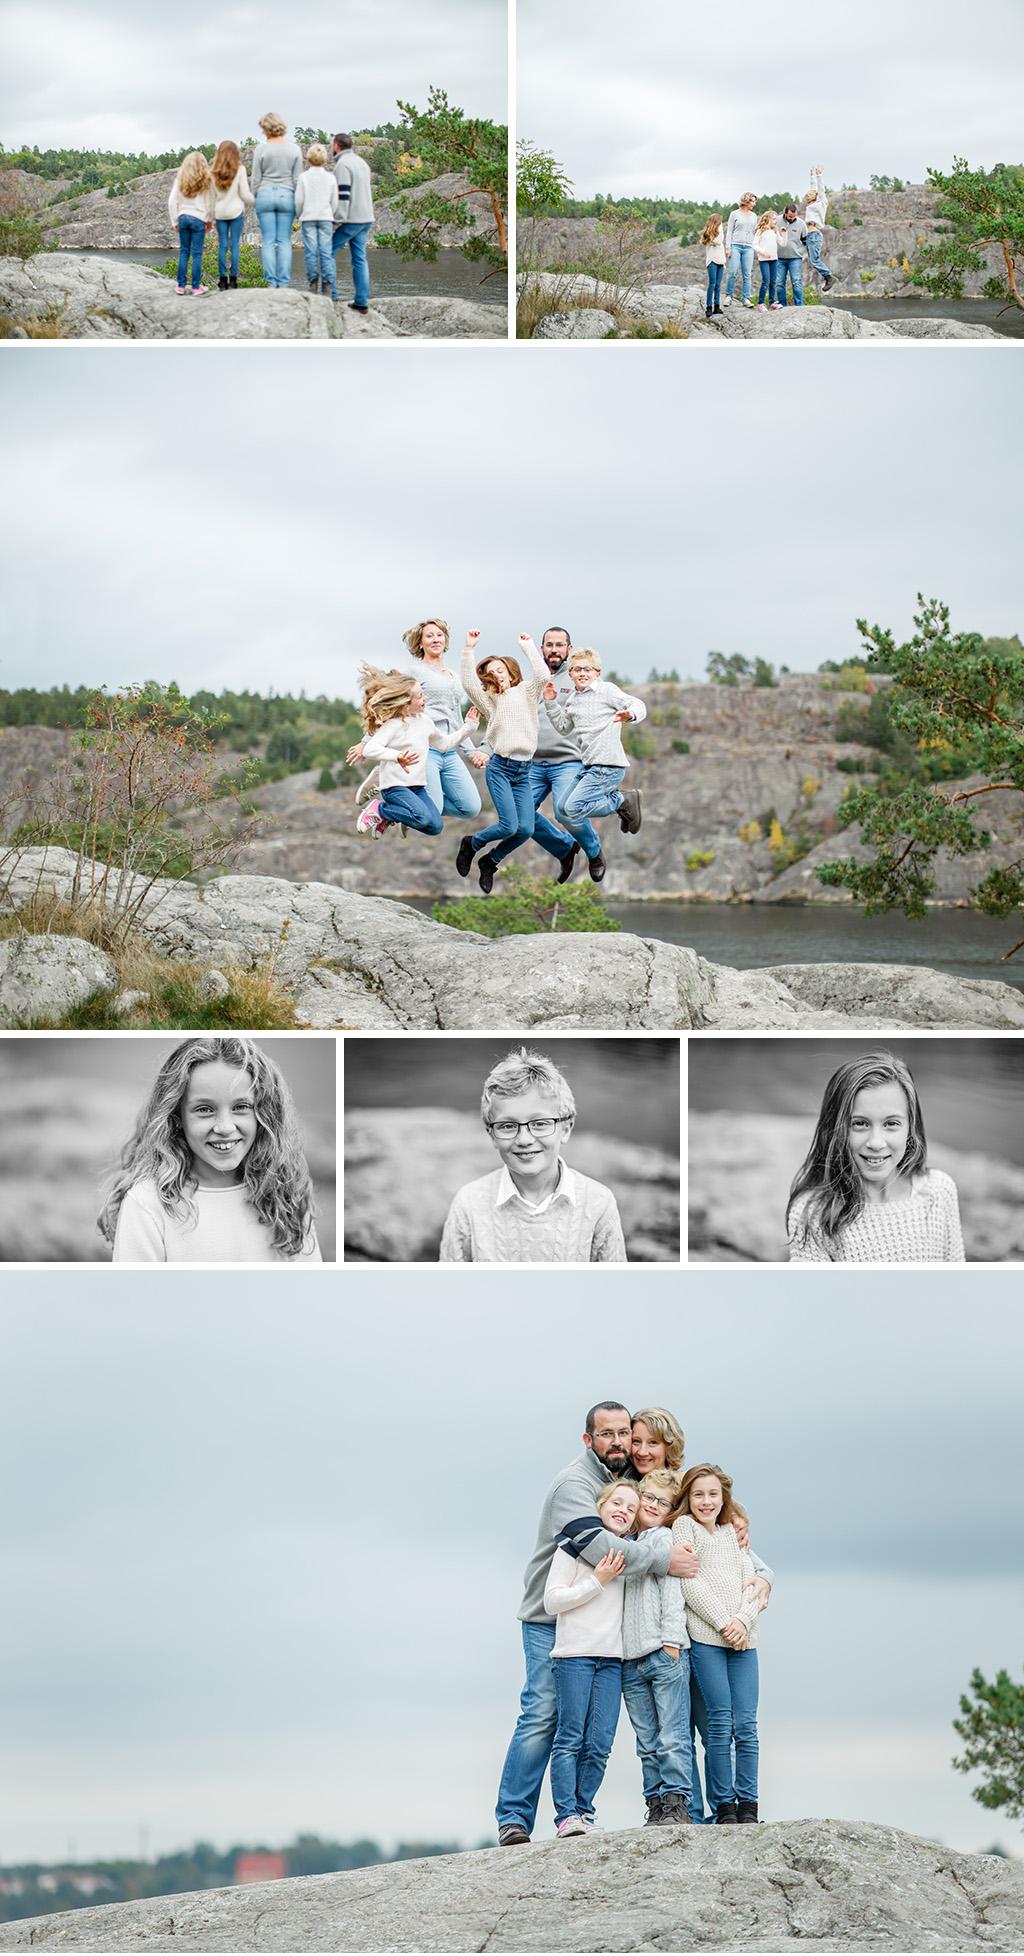 Familjefotografering_i-Stockholm_Lifestyle-familjefotograf-Anna-Sandstrom_4.jpg